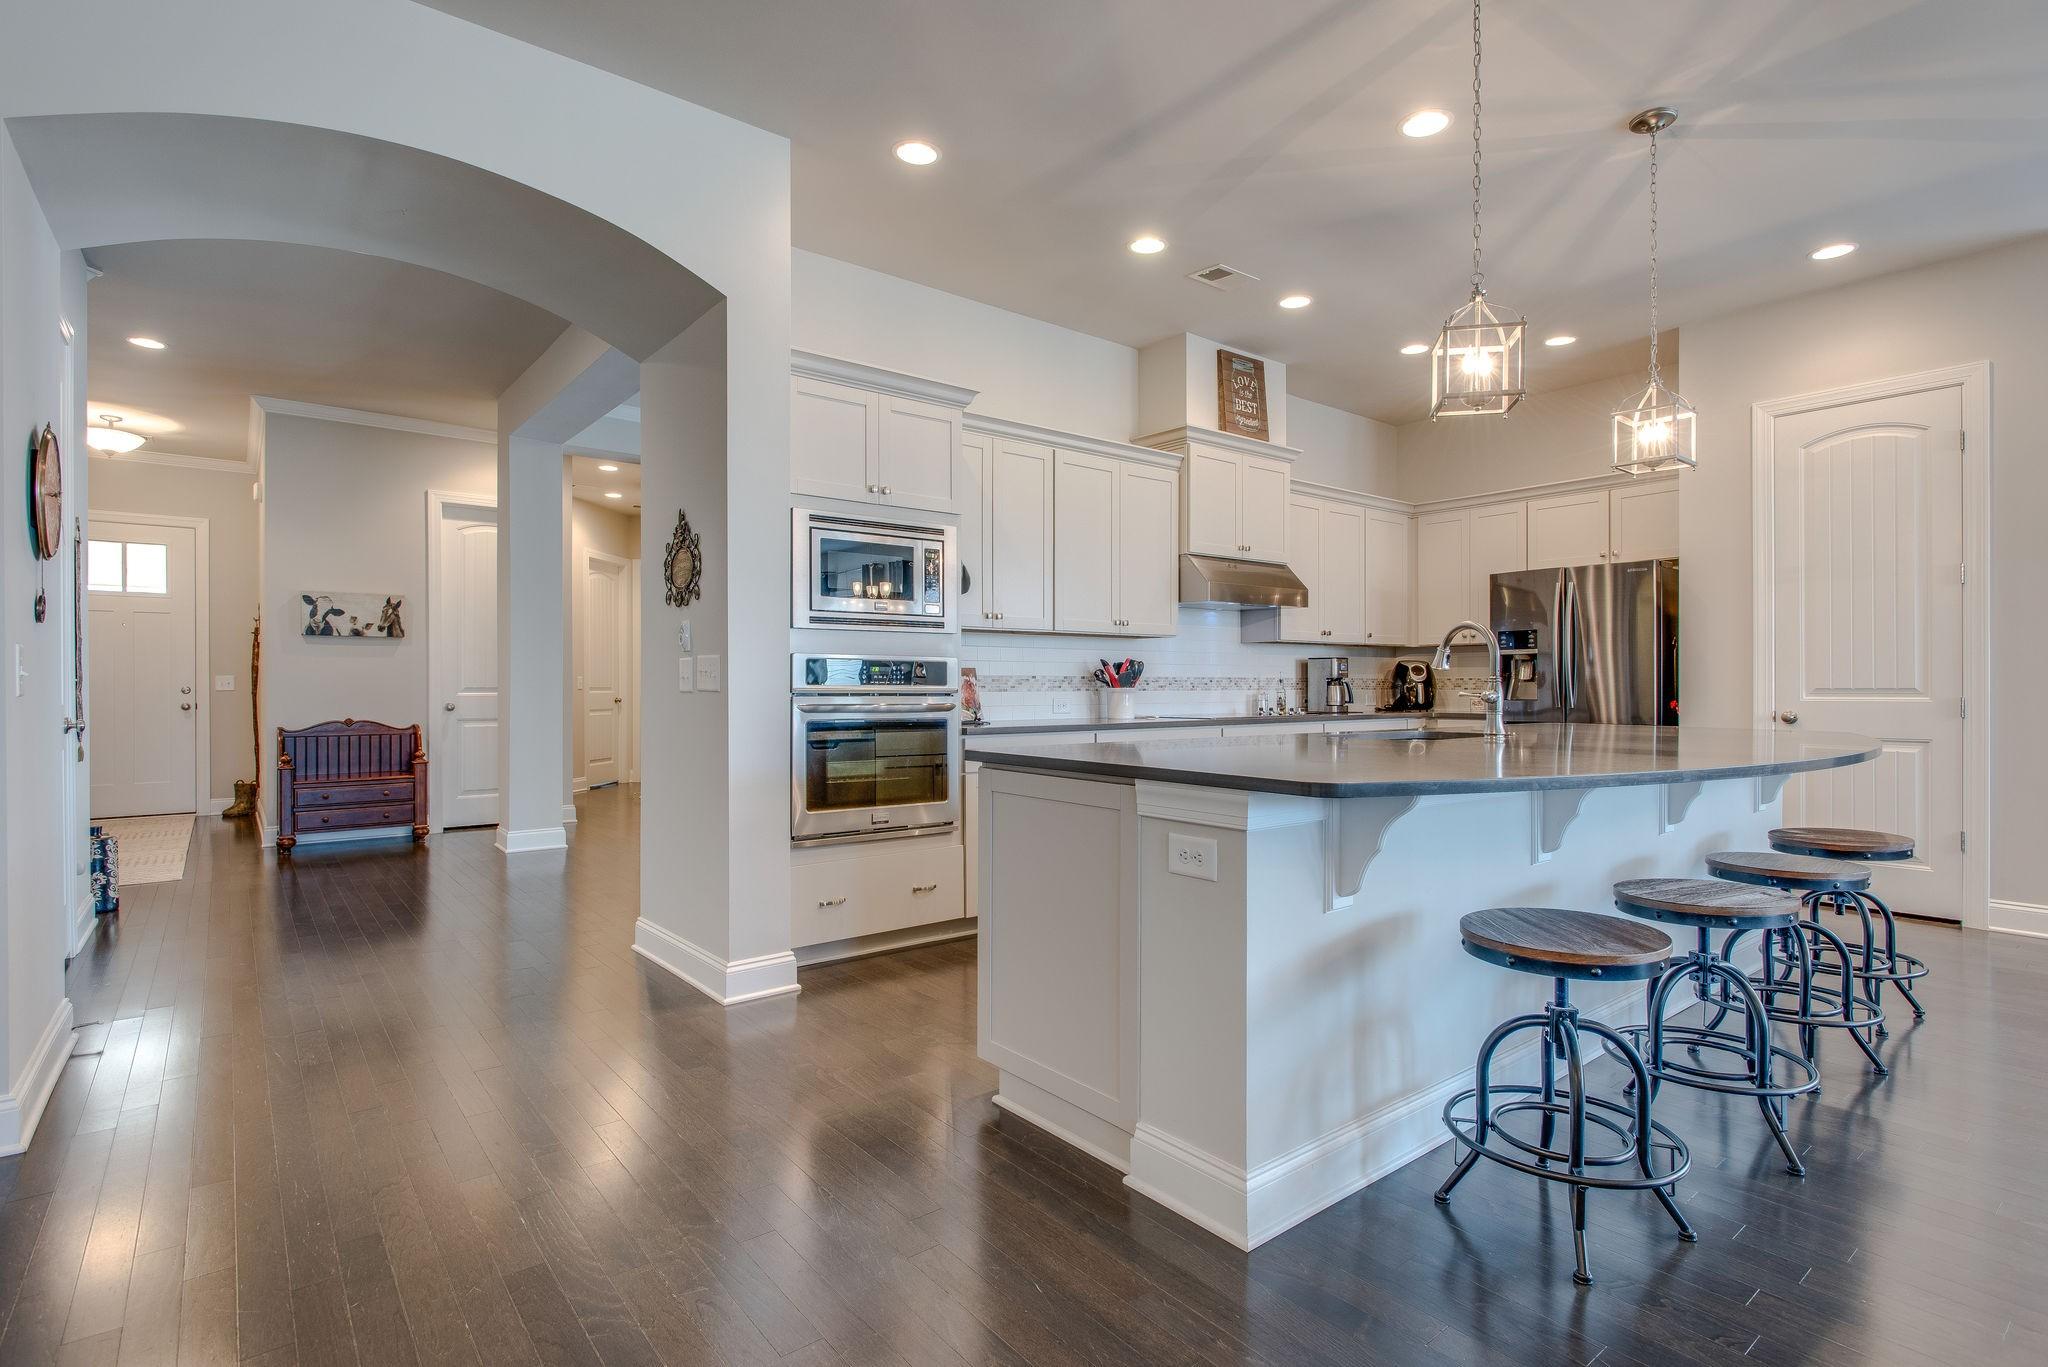 111 Championship Place #294, Hendersonville, TN 37075 - Hendersonville, TN real estate listing